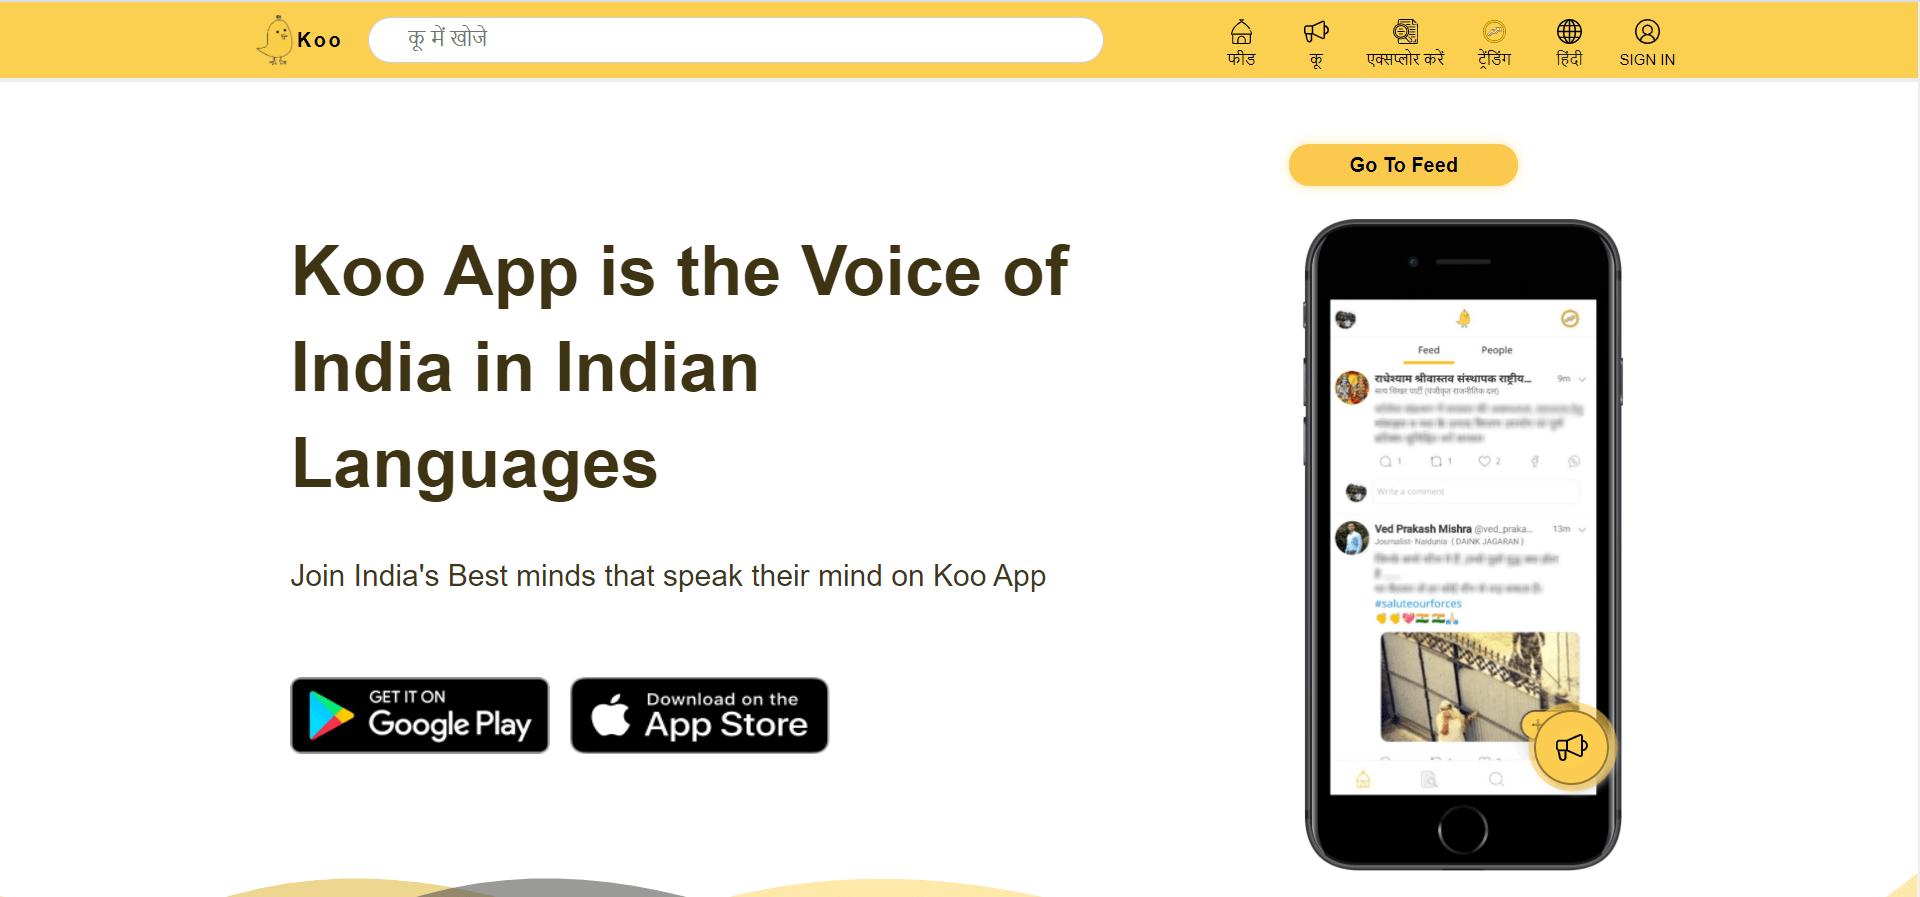 Koo App